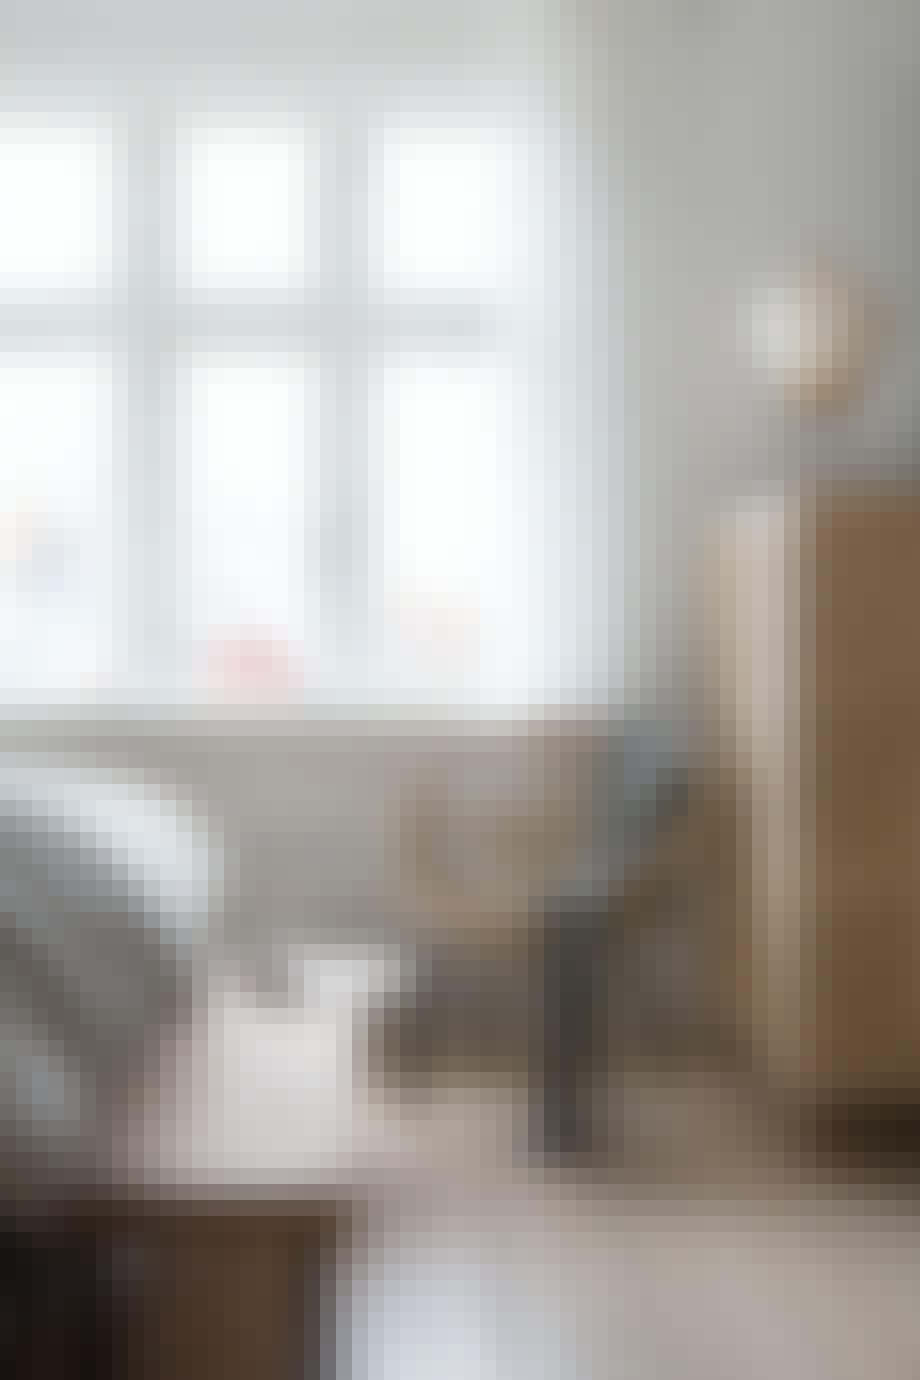 Stol Stockholm IKEA kork rispapir soveværelse